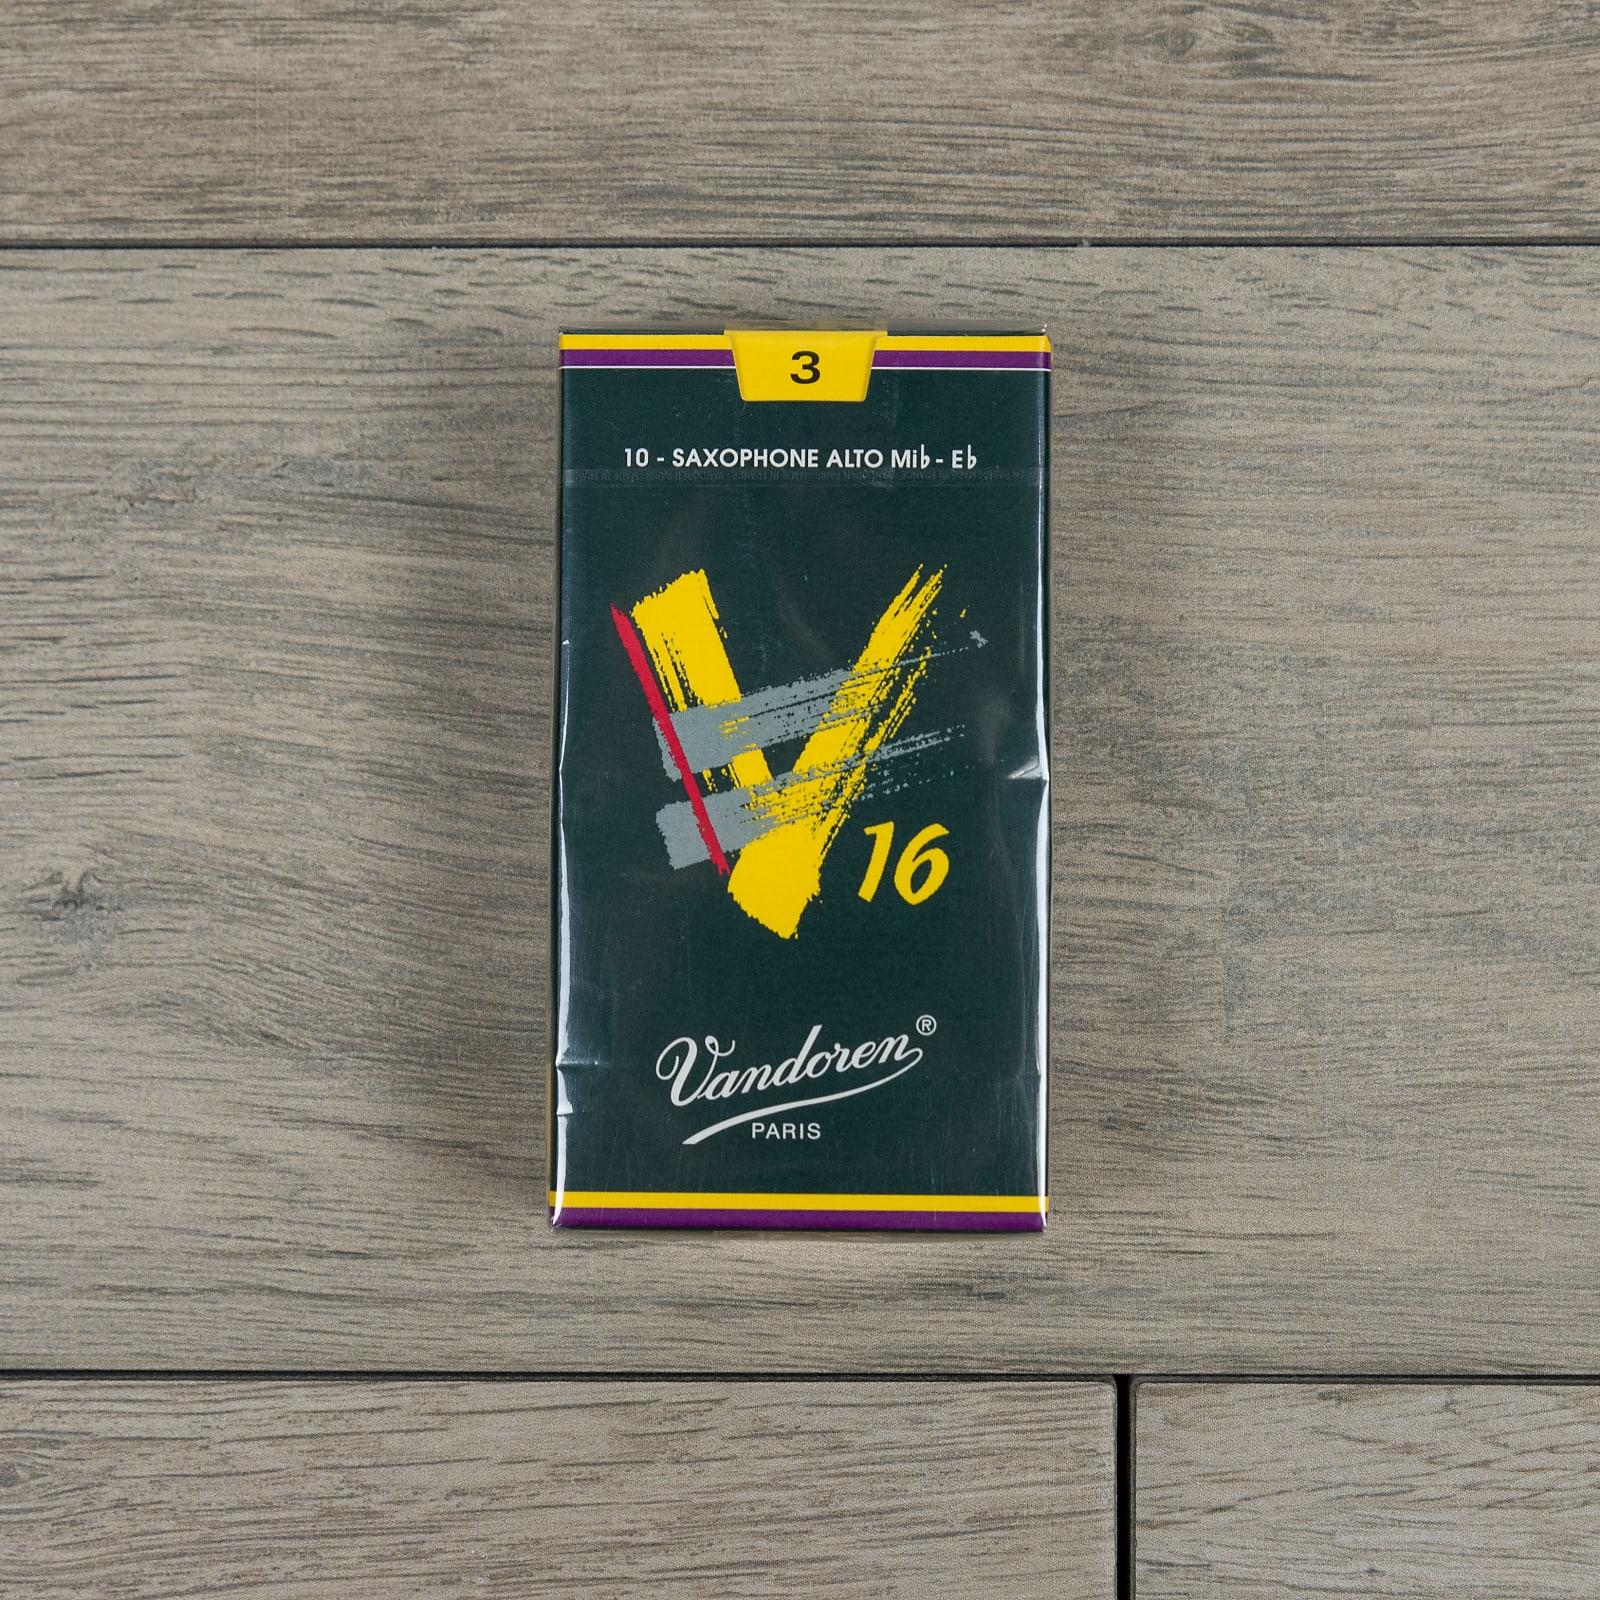 Box of 10 Strength 3.0 Vandoren Traditional Alto Saxophone Reeds